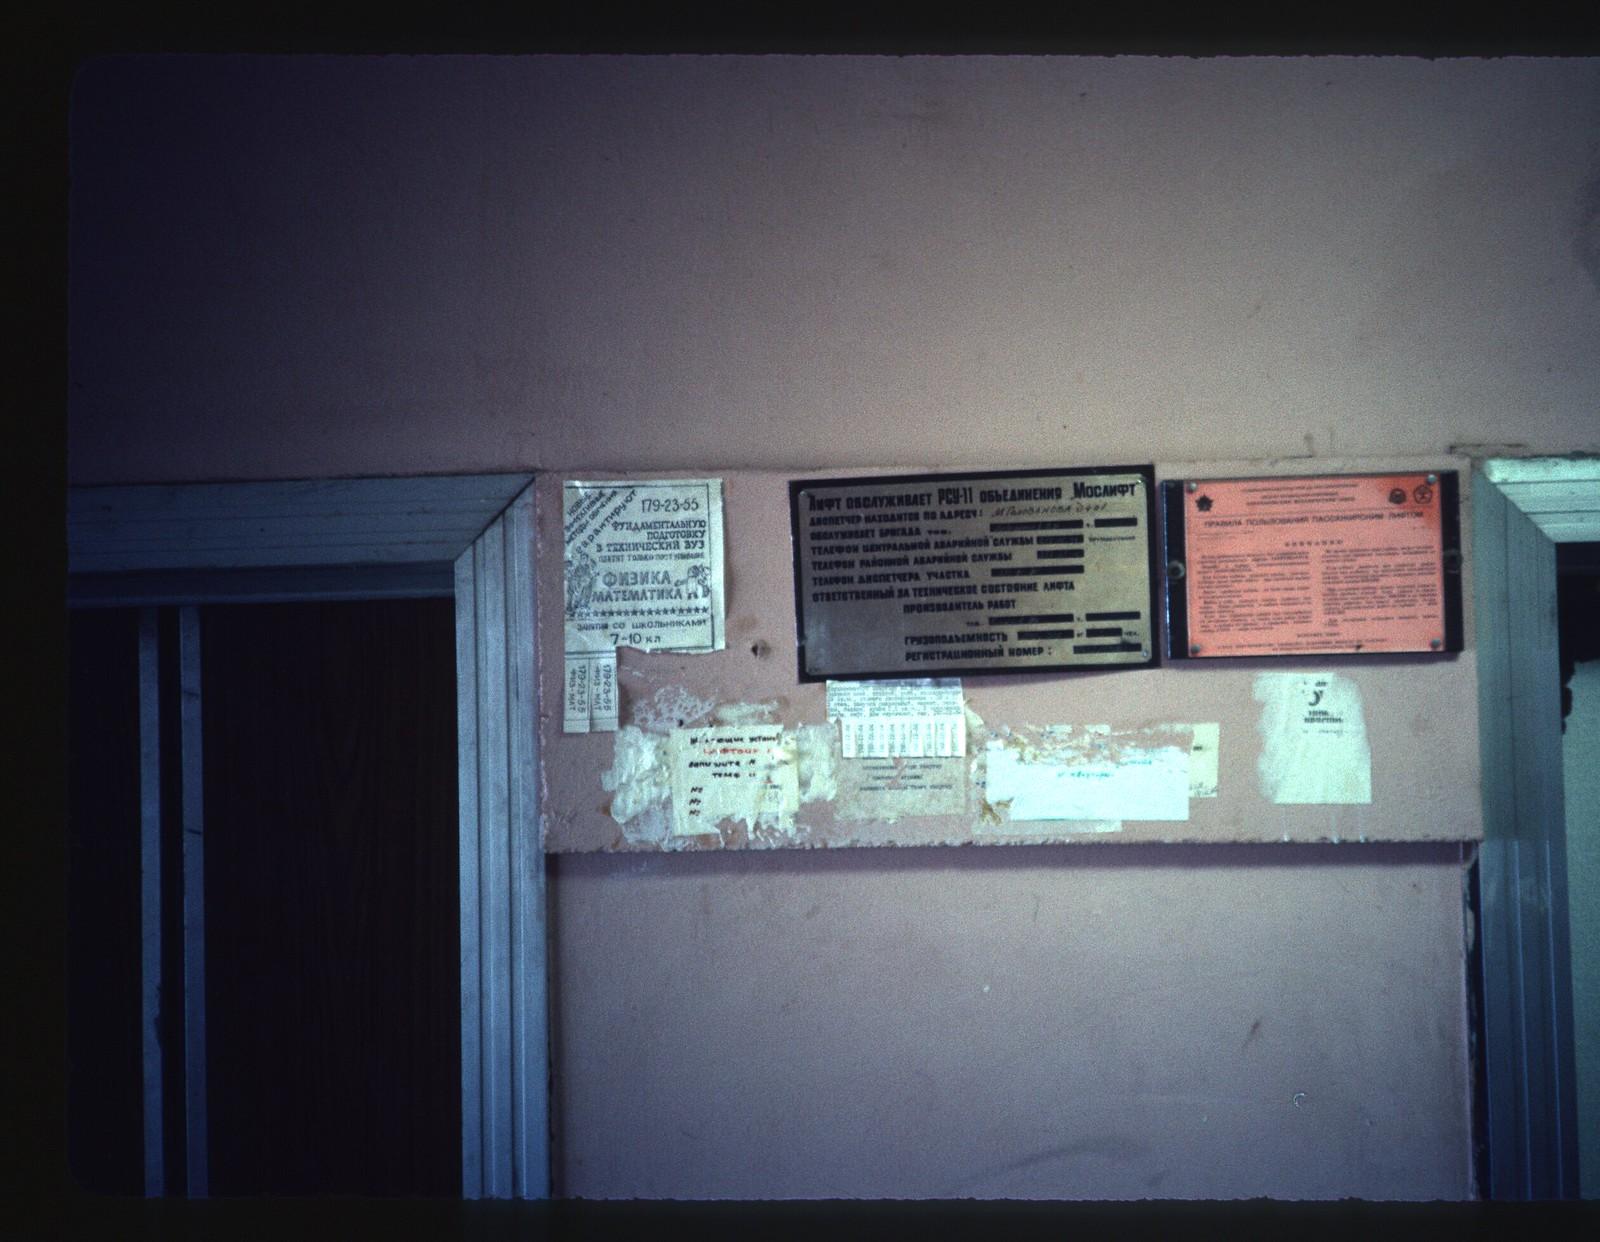 Марьино, 2Б. 16 этаж, лифты